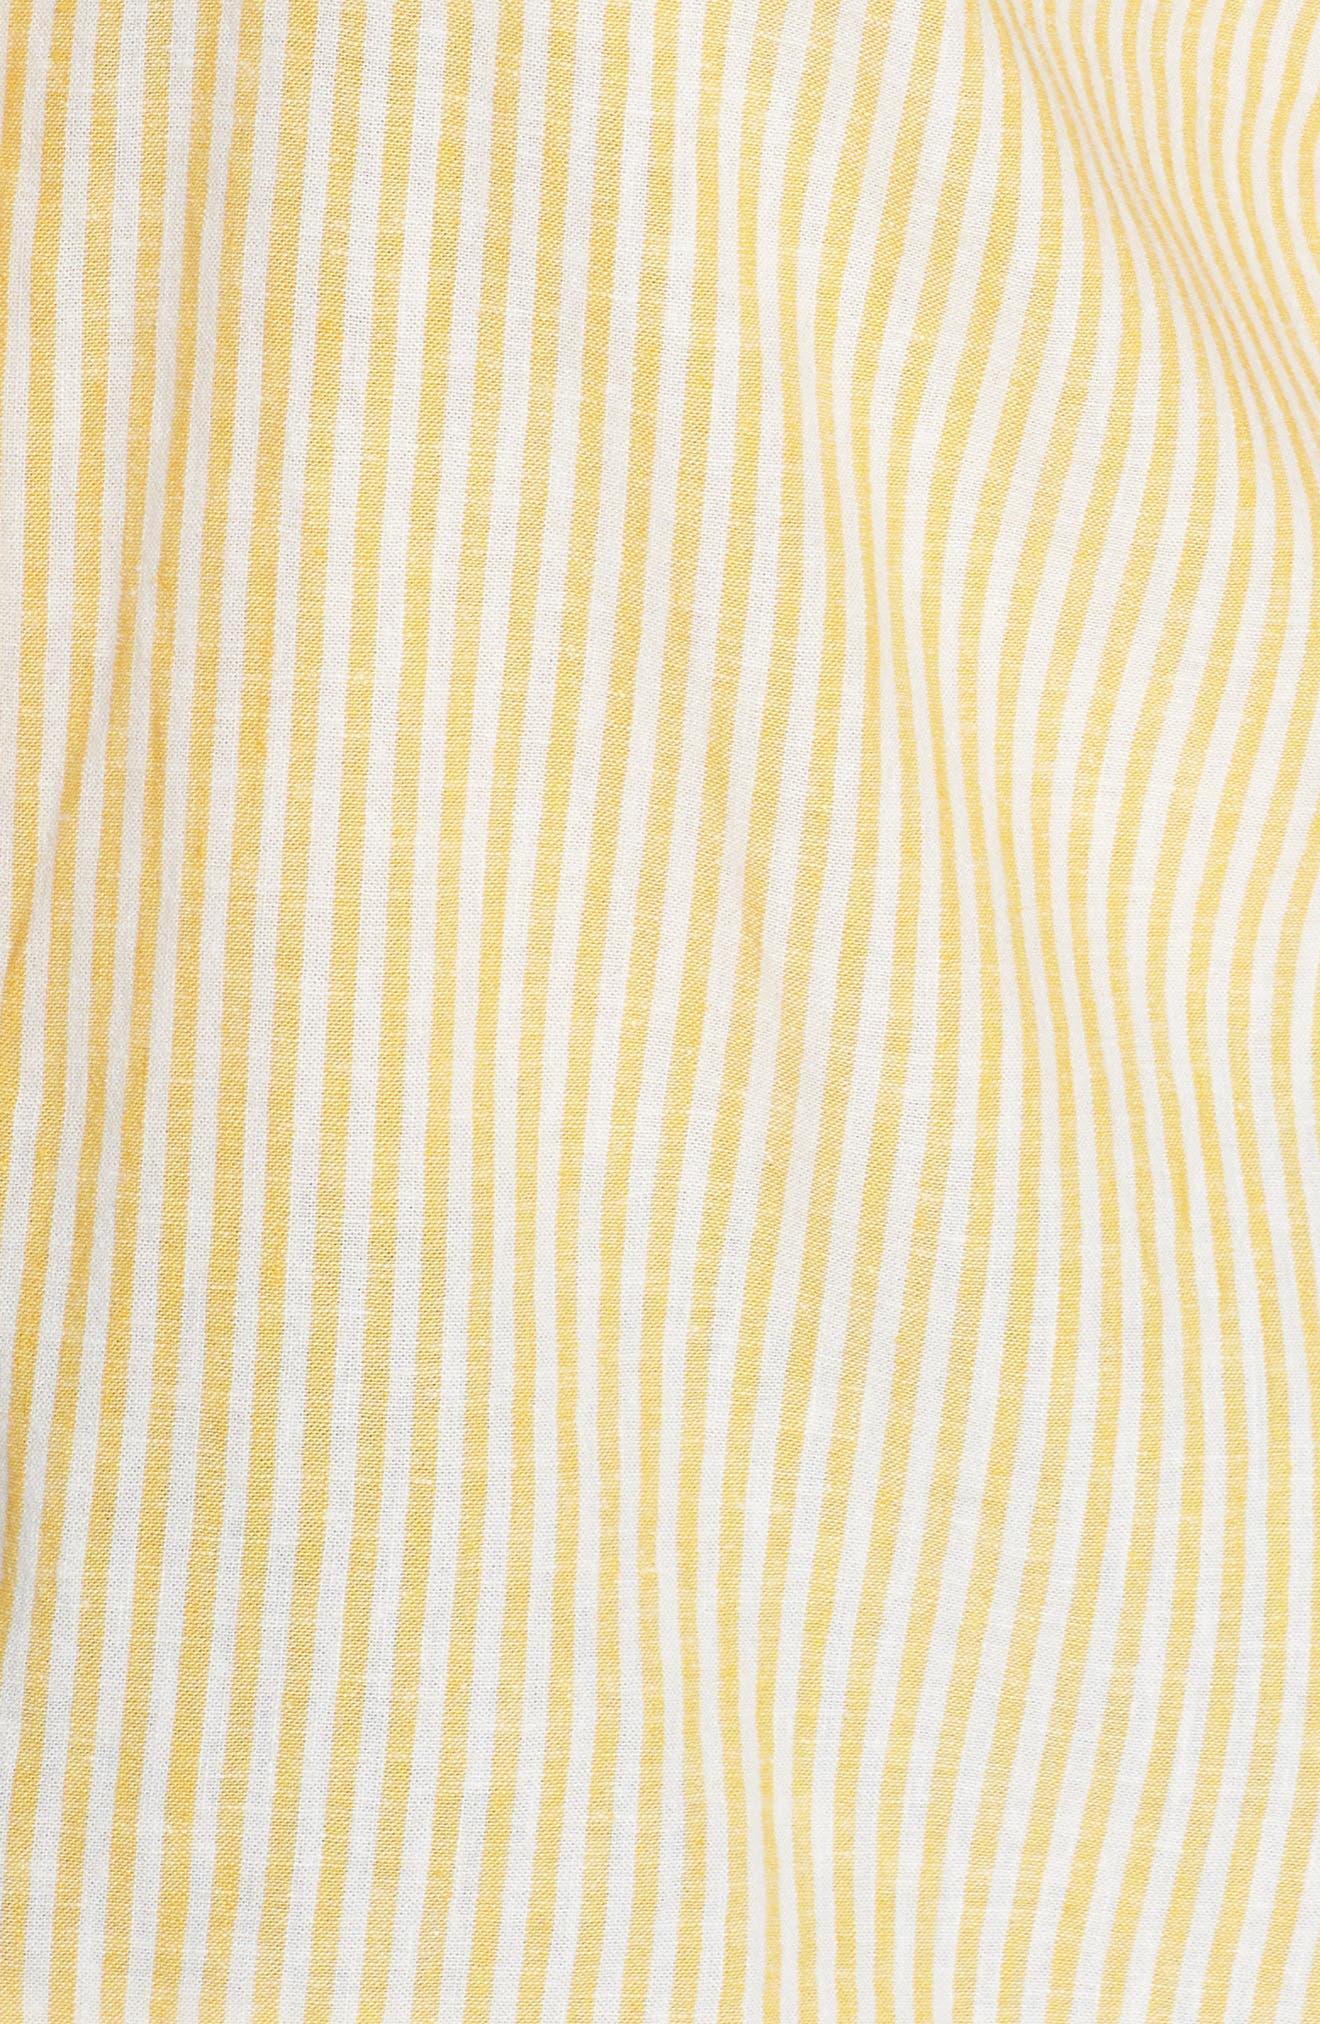 BP.,                             Button Front Linen Blend Top,                             Alternate thumbnail 11, color,                             YELLOW WHIP MARA STRIPE